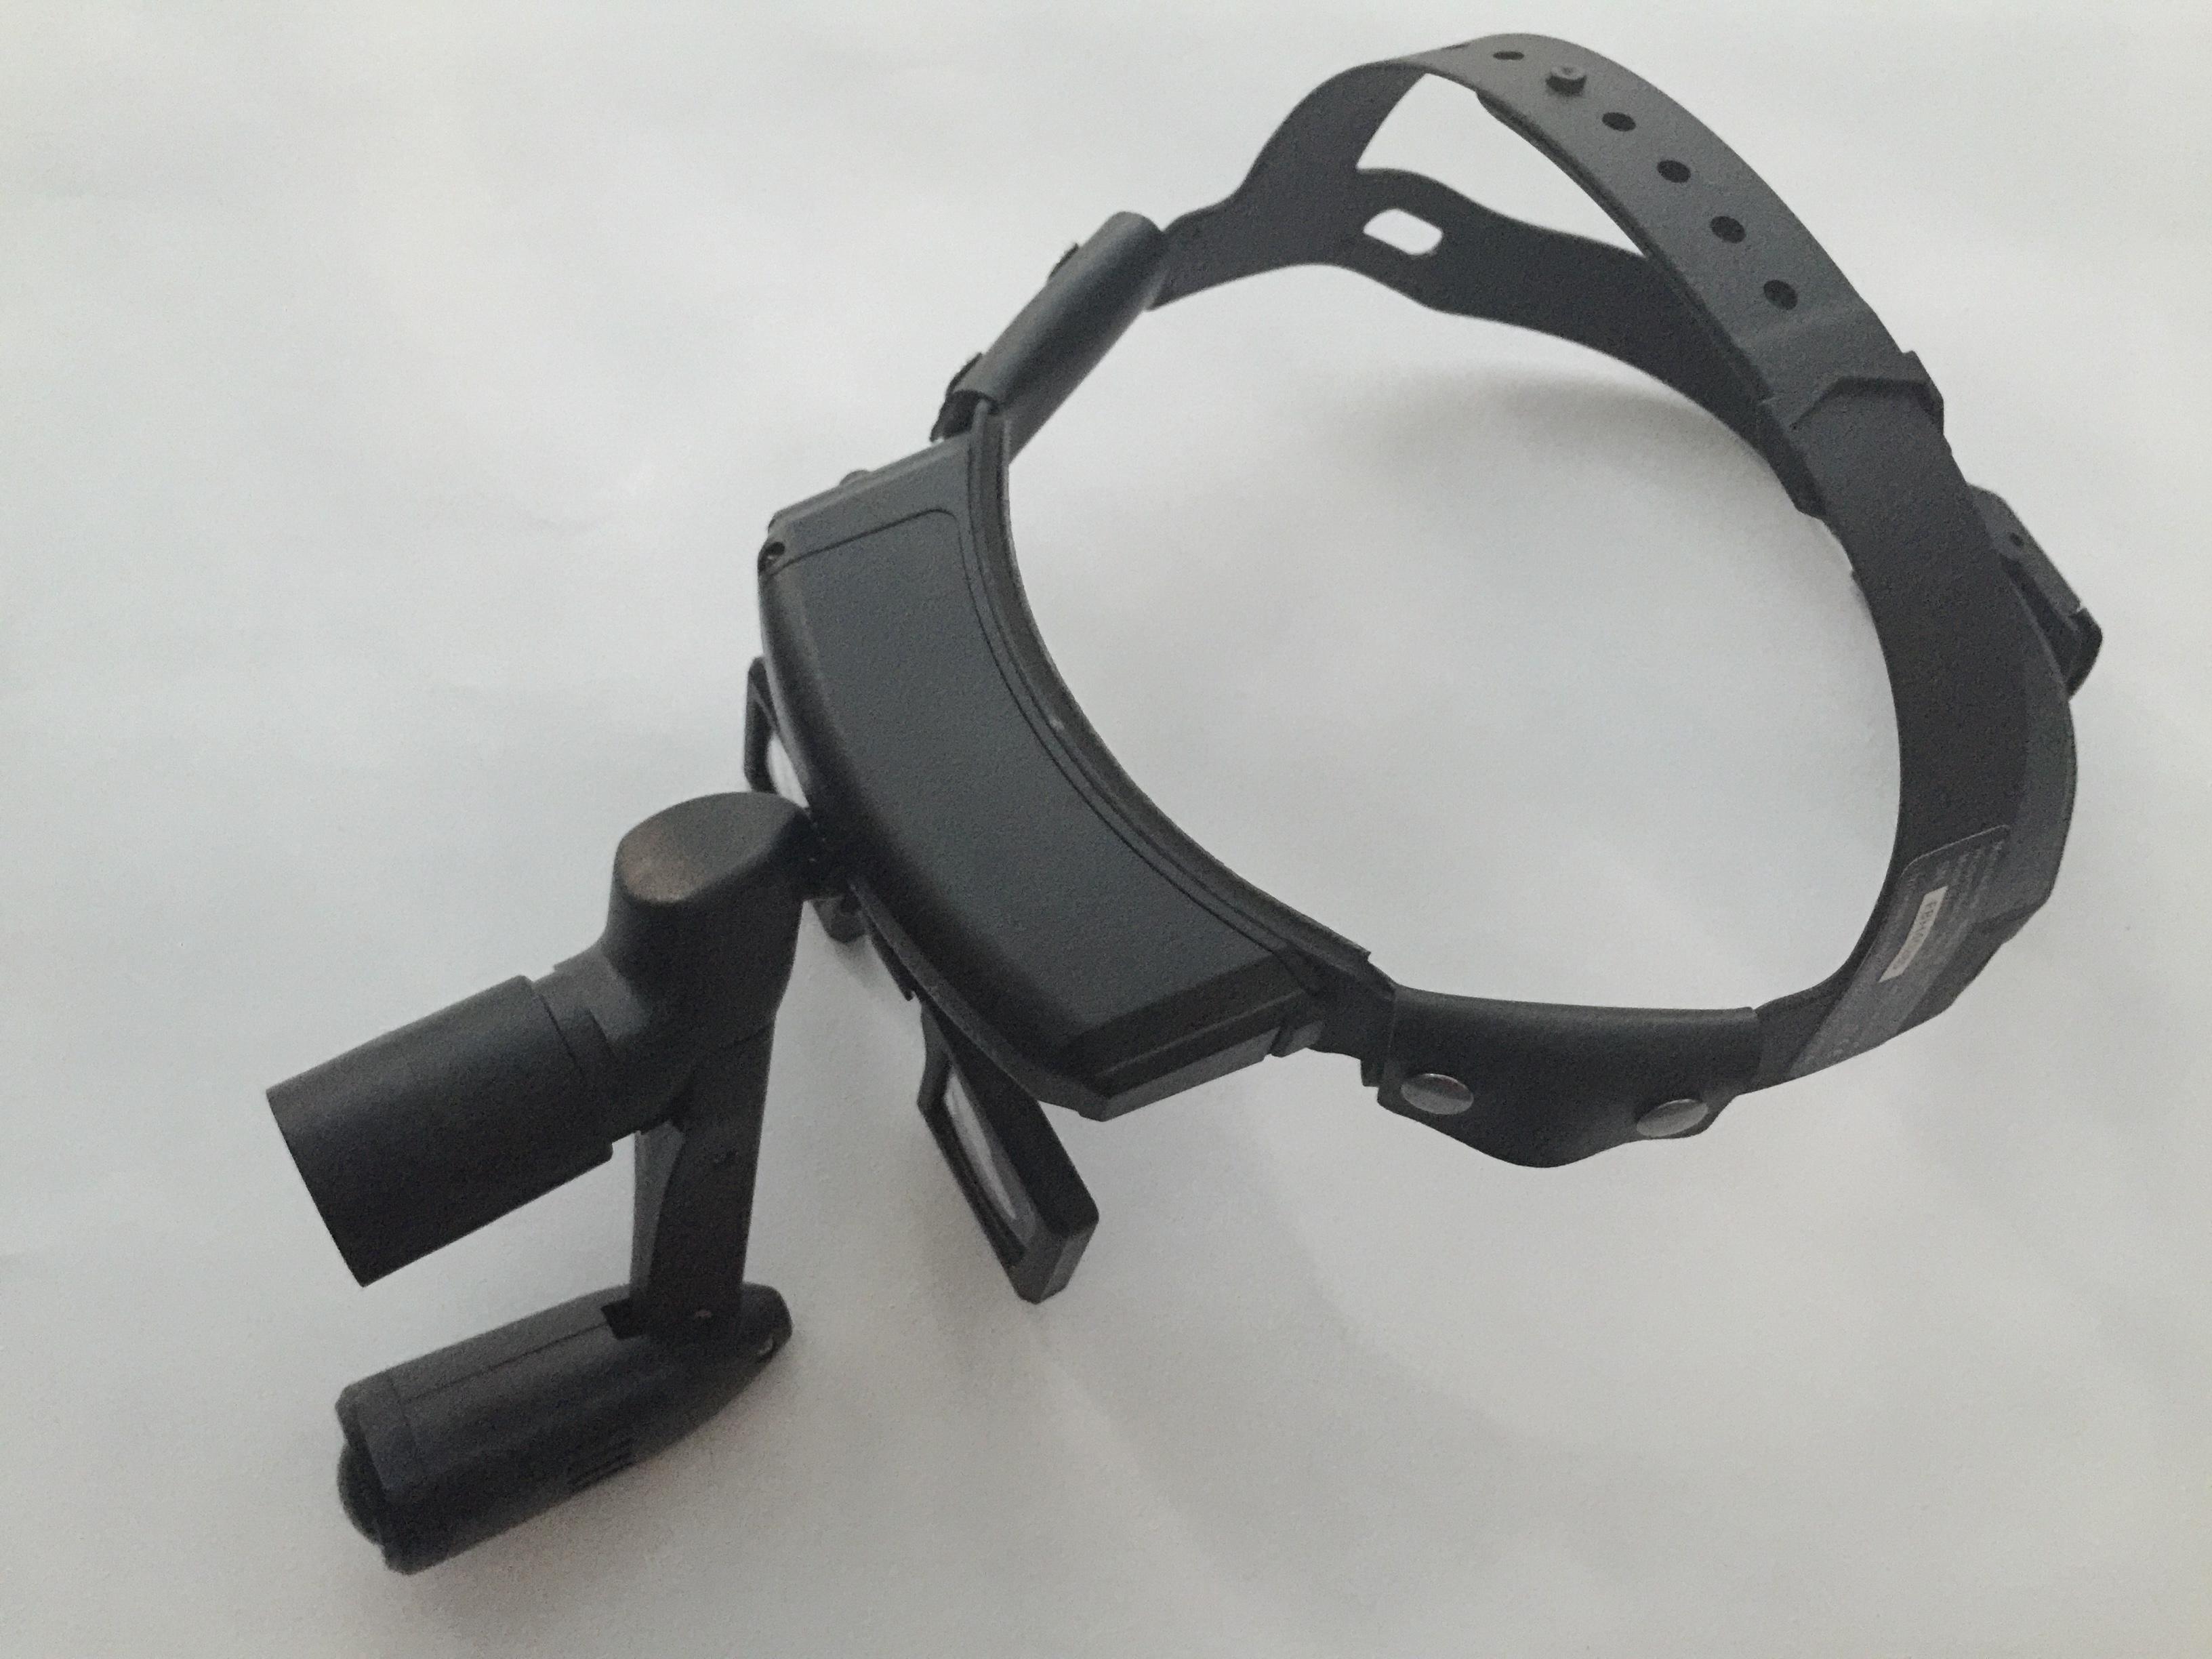 Lampa frontala LED BT-410AL, fascicul de lumina ajustabil, inclusiv lampa Astral si lupa tip ochelari